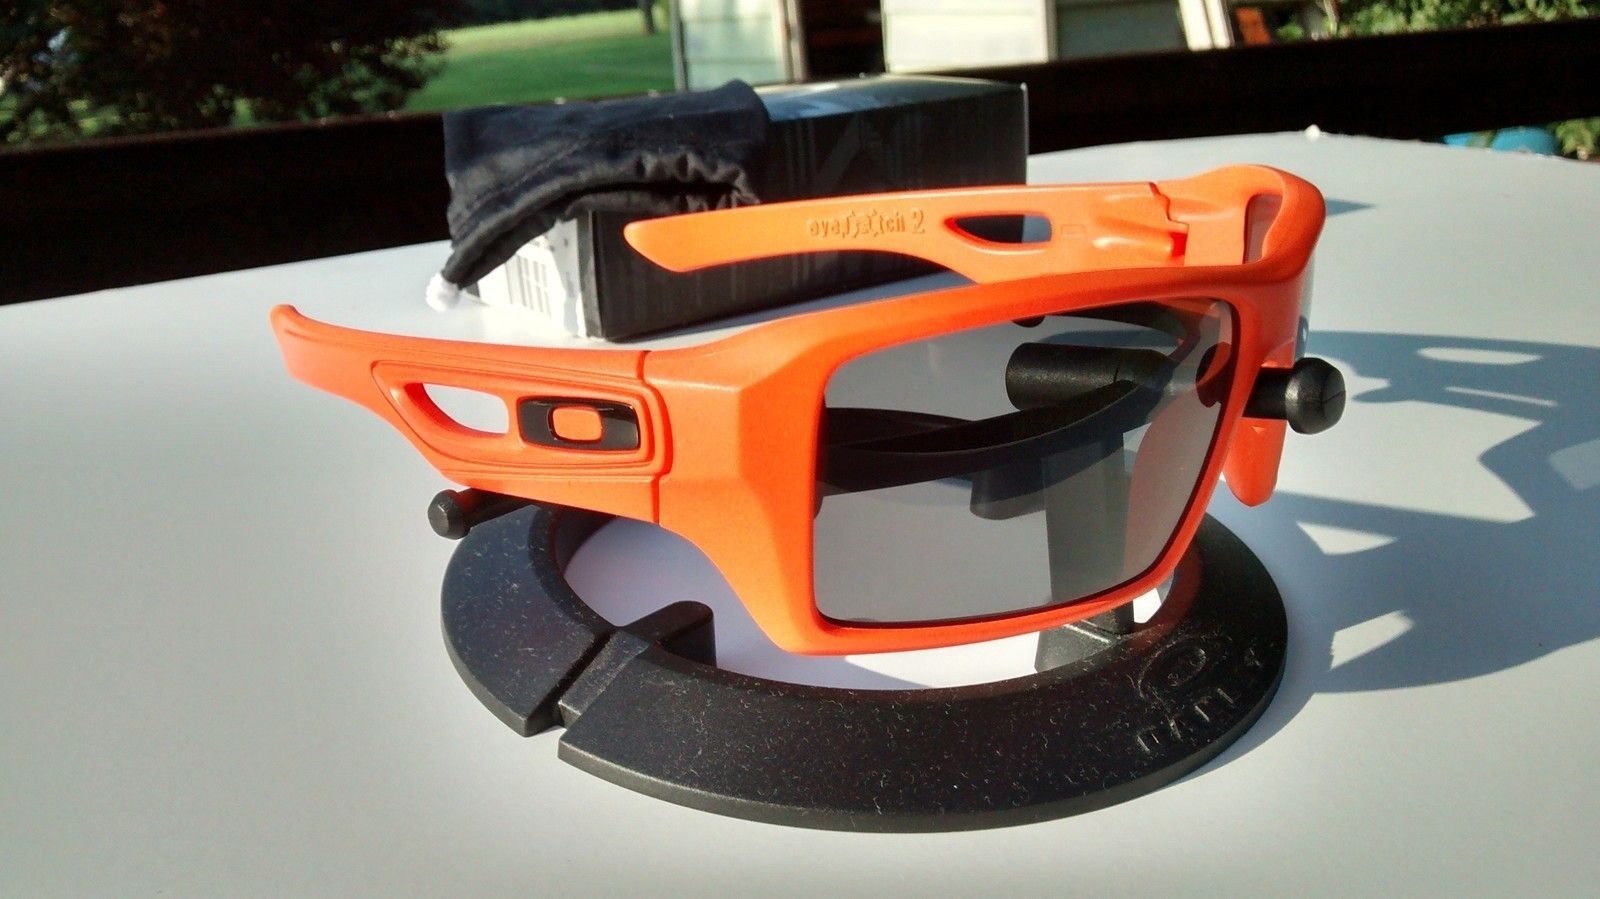 Safety Orange Cerakote Eyepatch 2 - BrPNguI.jpg